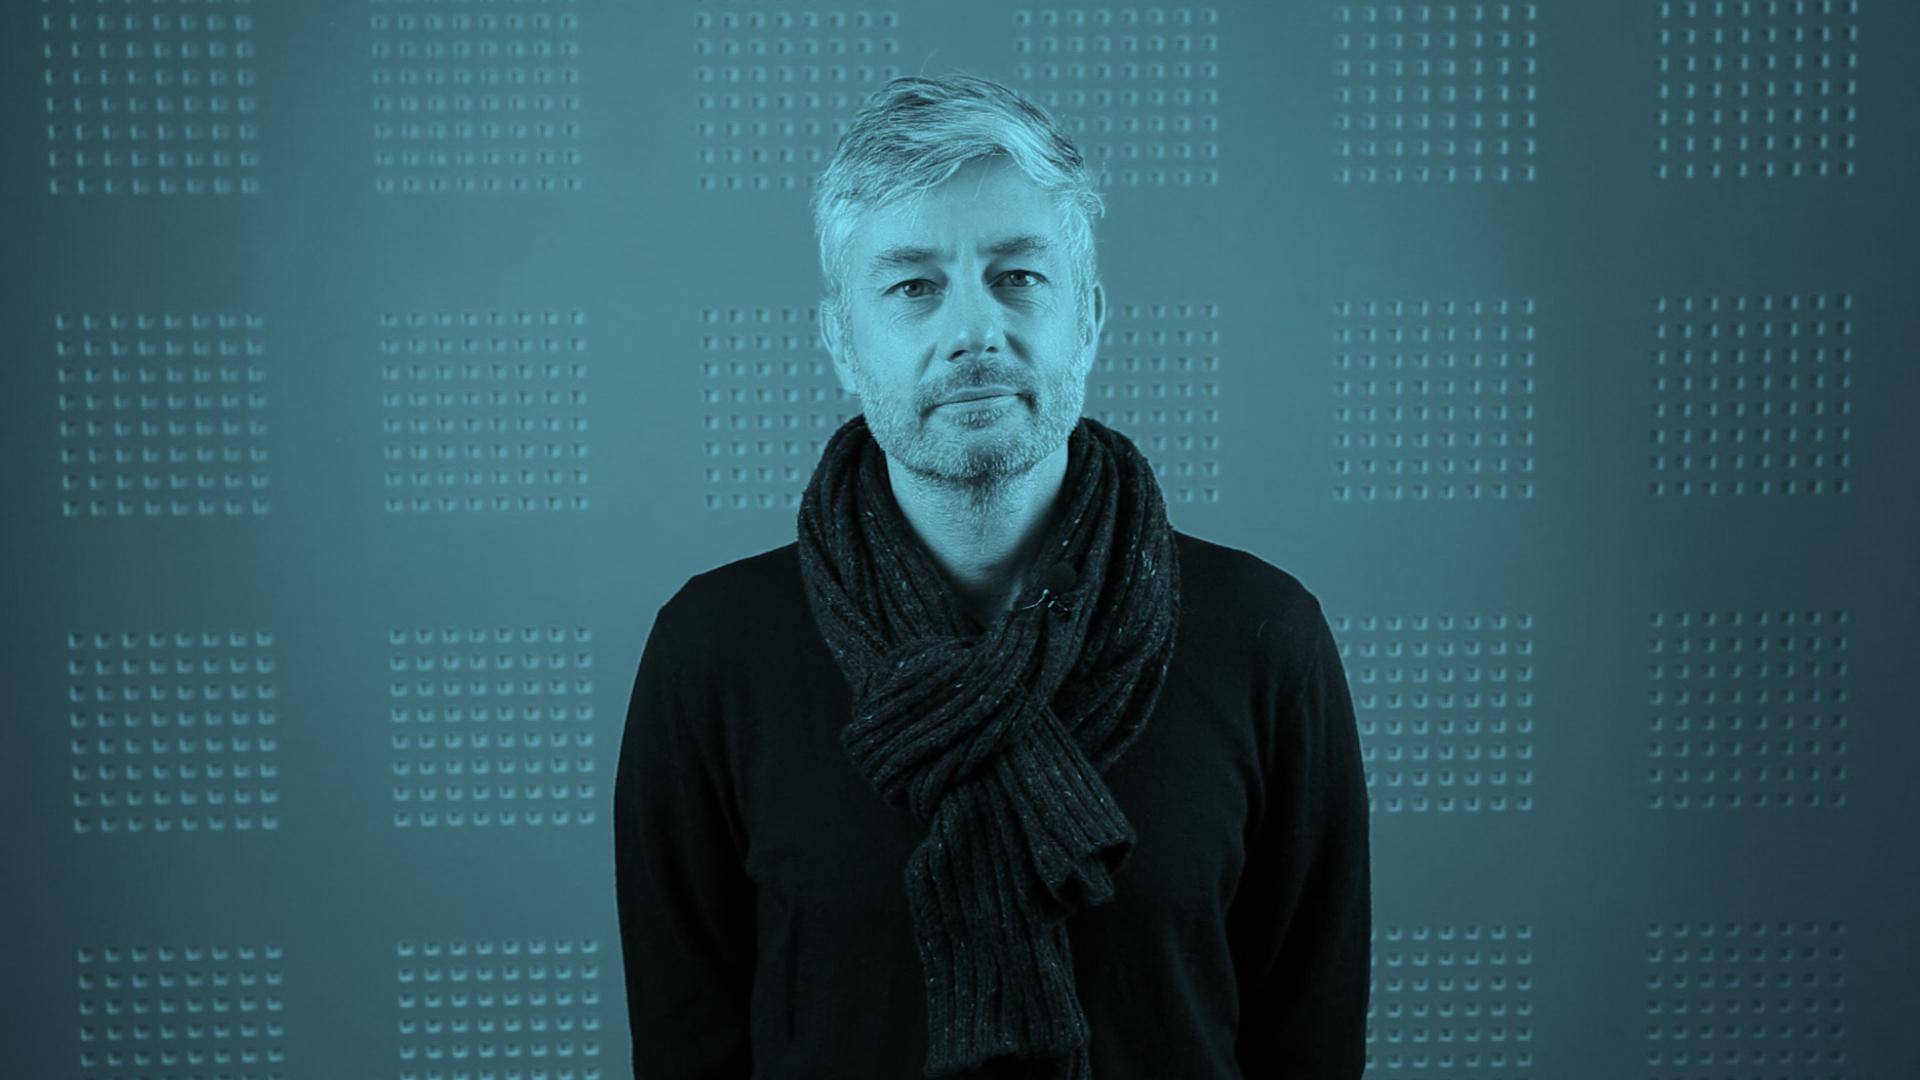 Pierre-Yves Panis, directeiur du design chez Philips Lightning